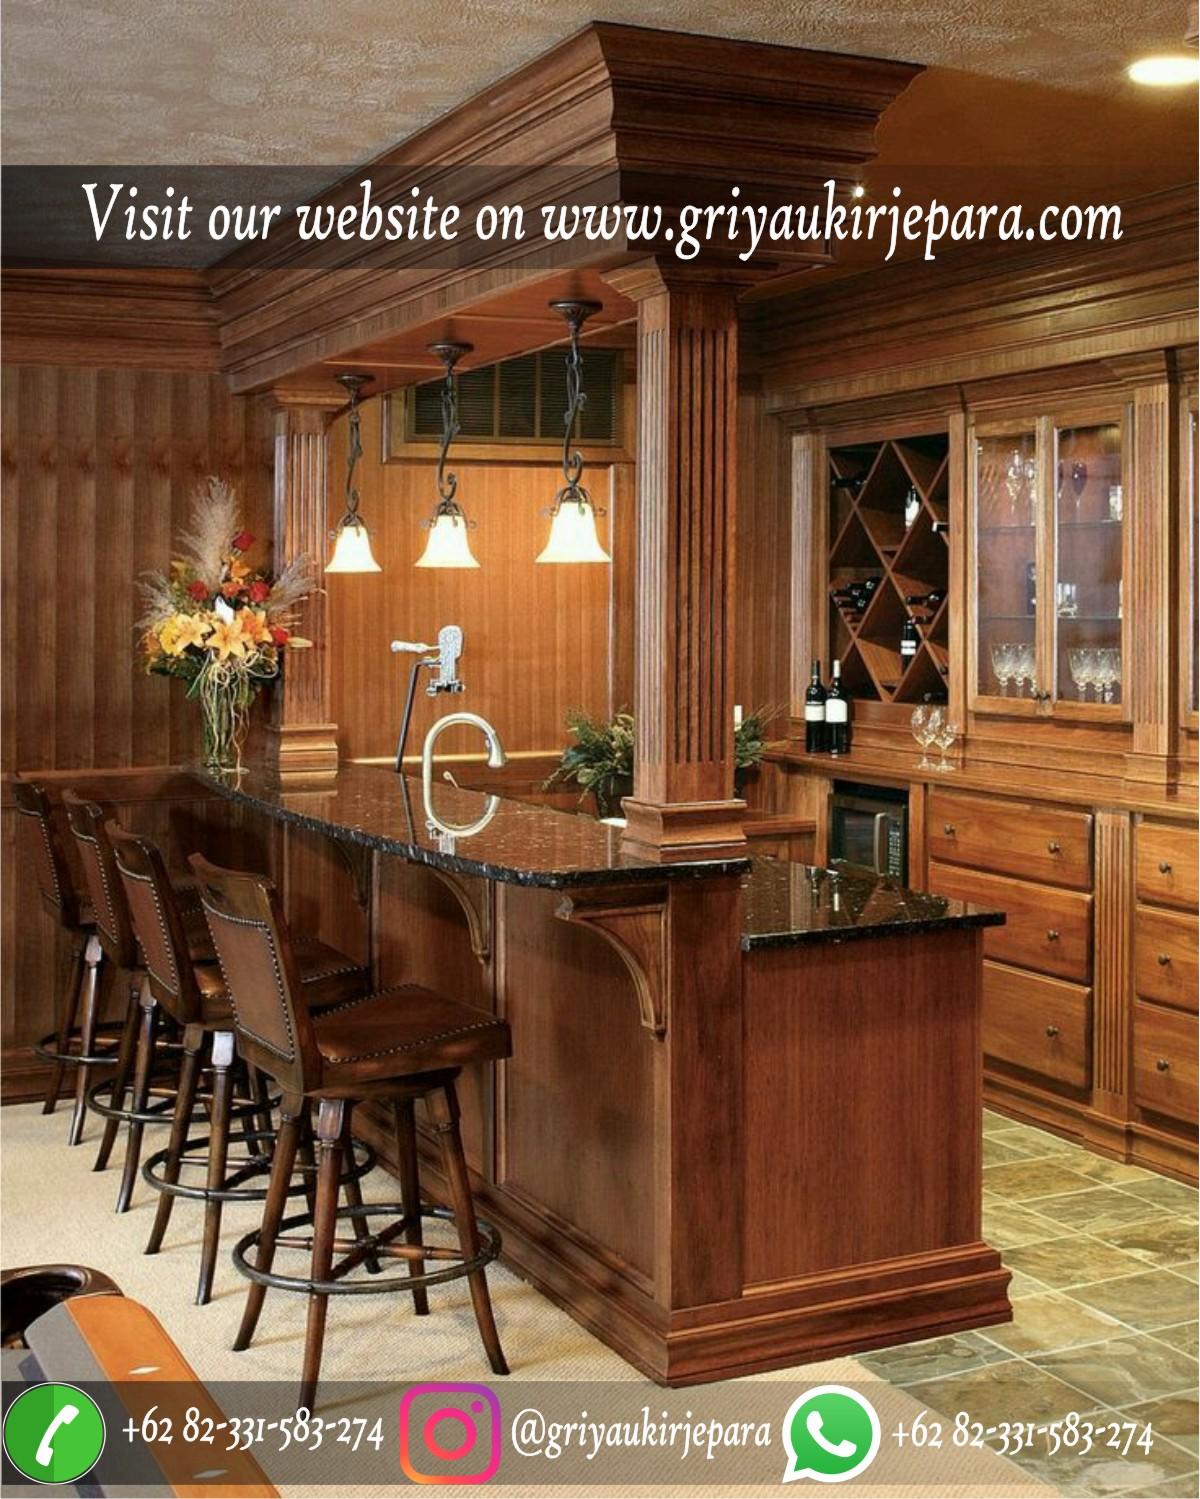 kursi dan meja bar 10 - Meja Dan Kursi Bar Cafe Minimalis